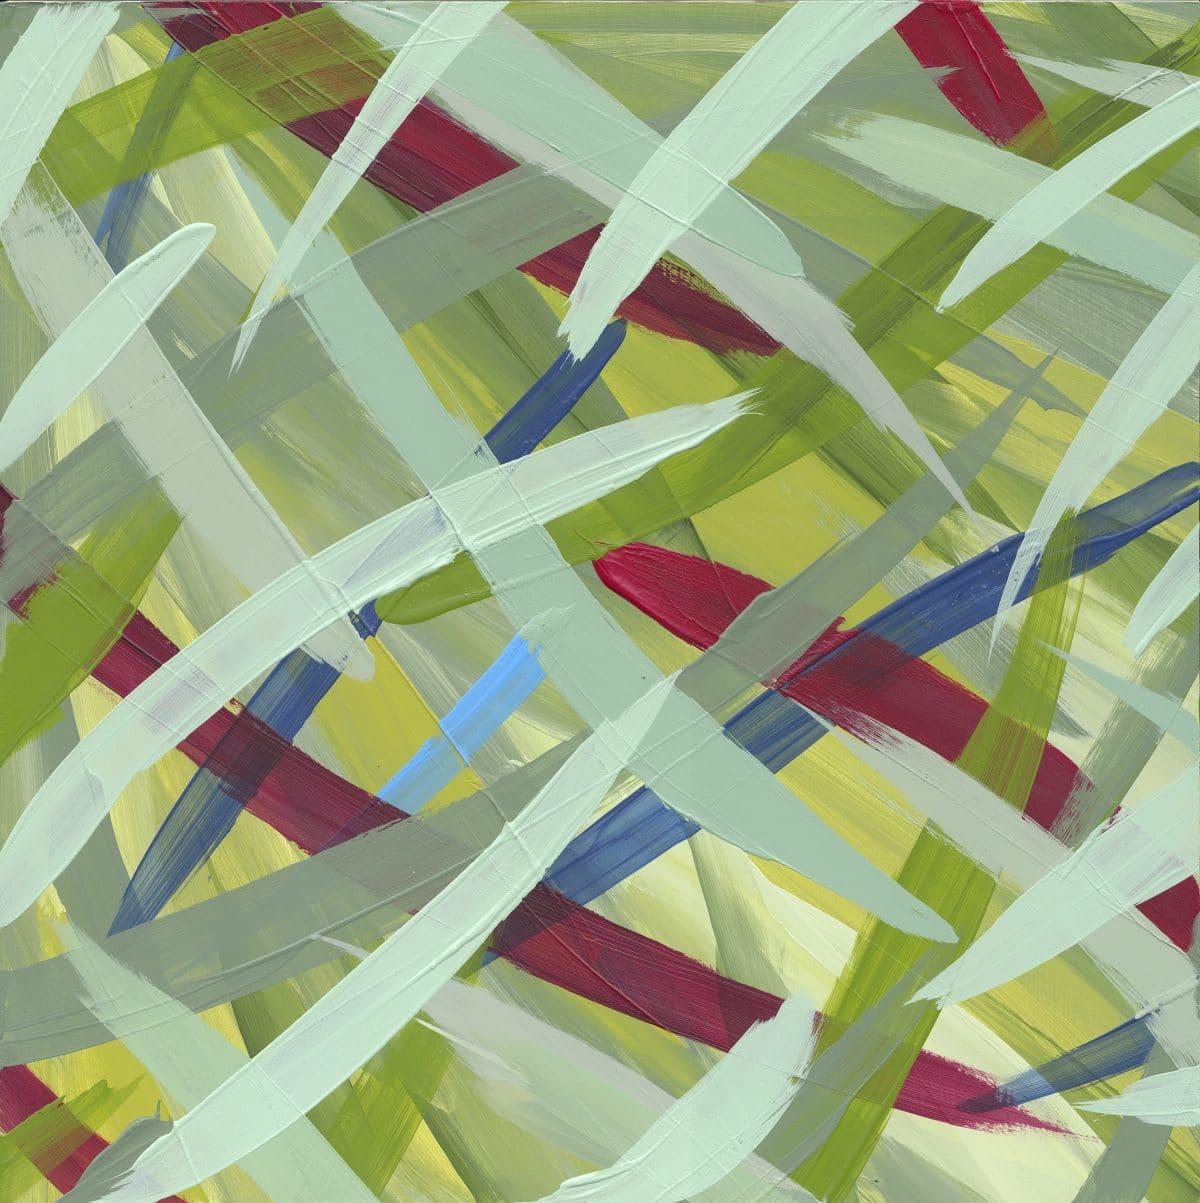 Continuous Painting 16 Lori Dorfman abstract color acrylic art